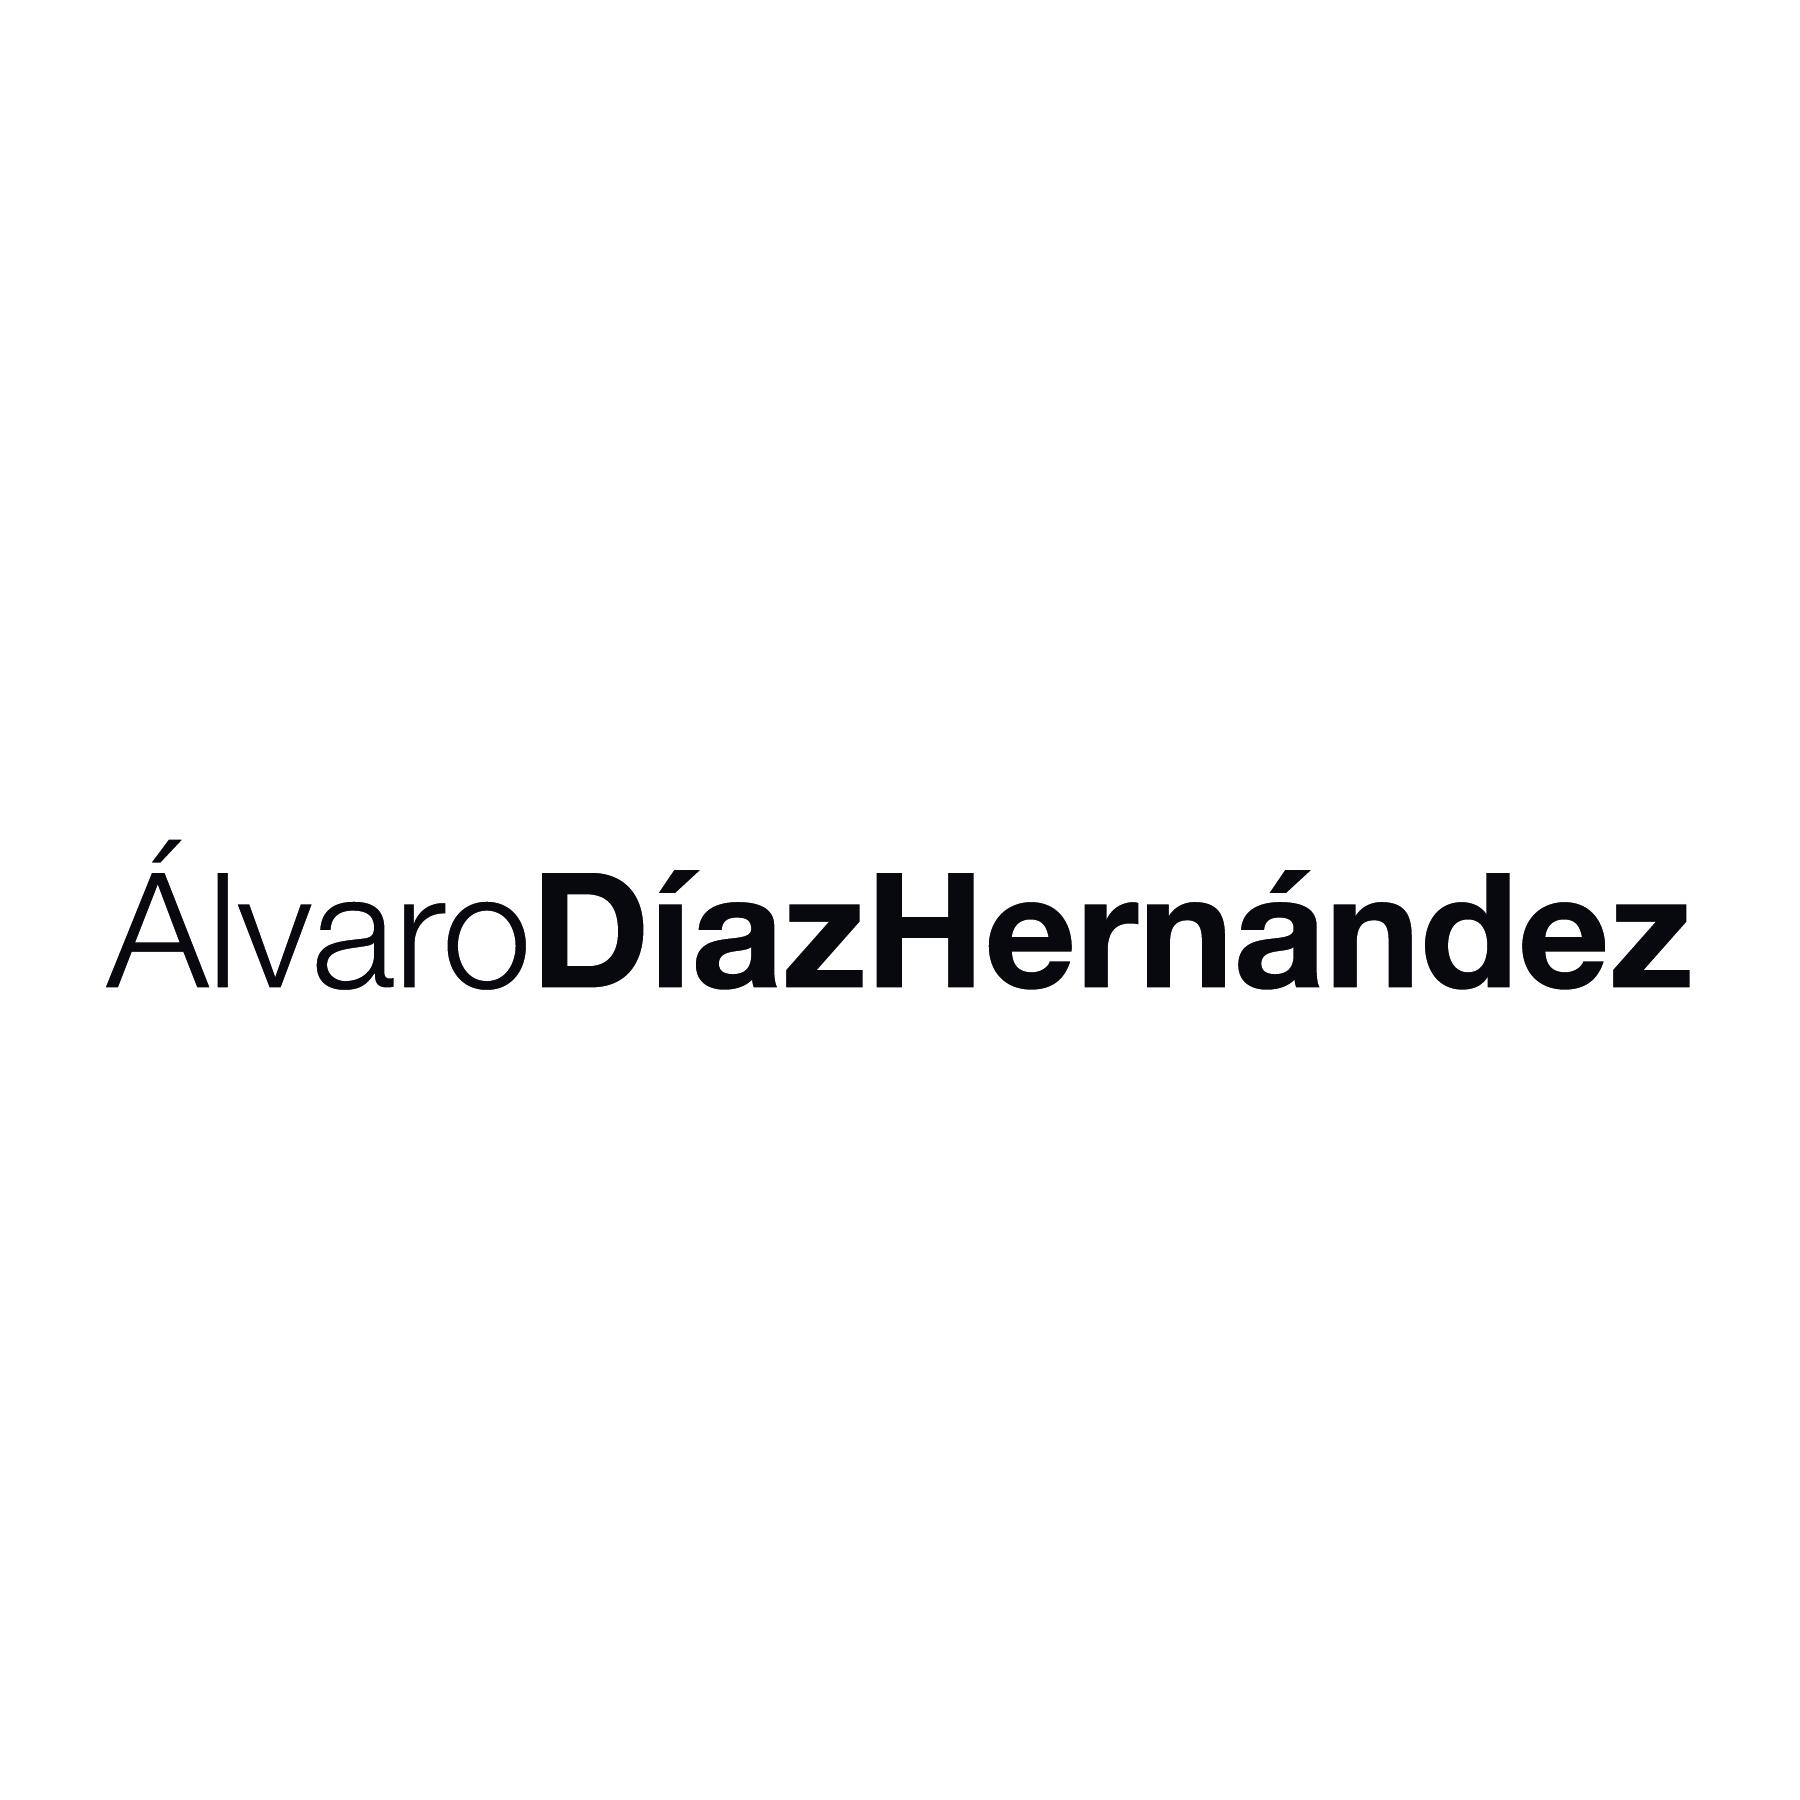 Álvaro Díaz Hernández